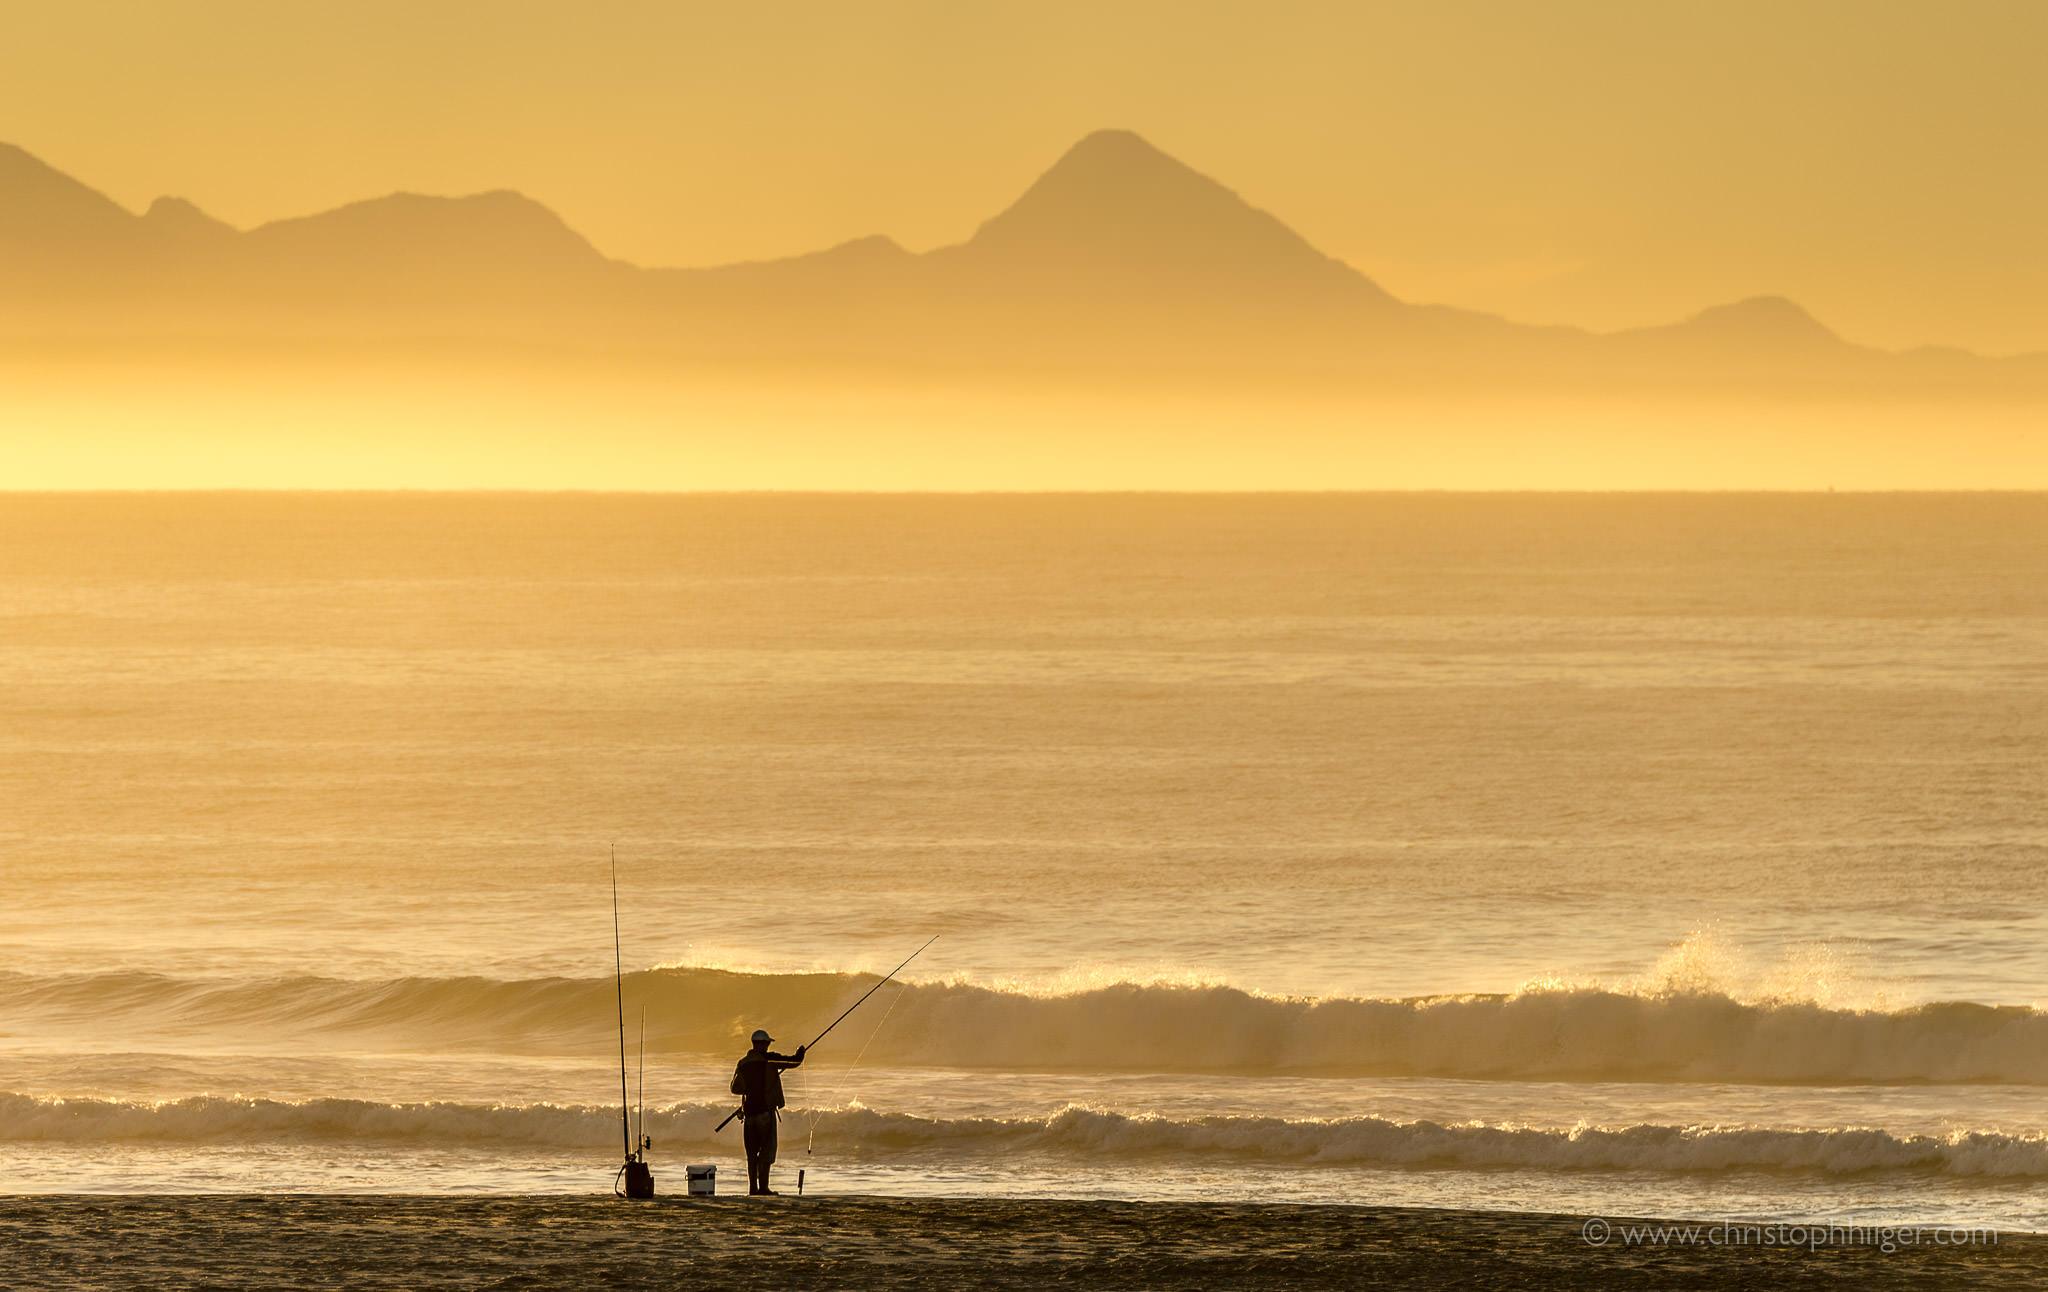 Angler bei Sonnenaufgang in Plettenberg Bay, Südafrika